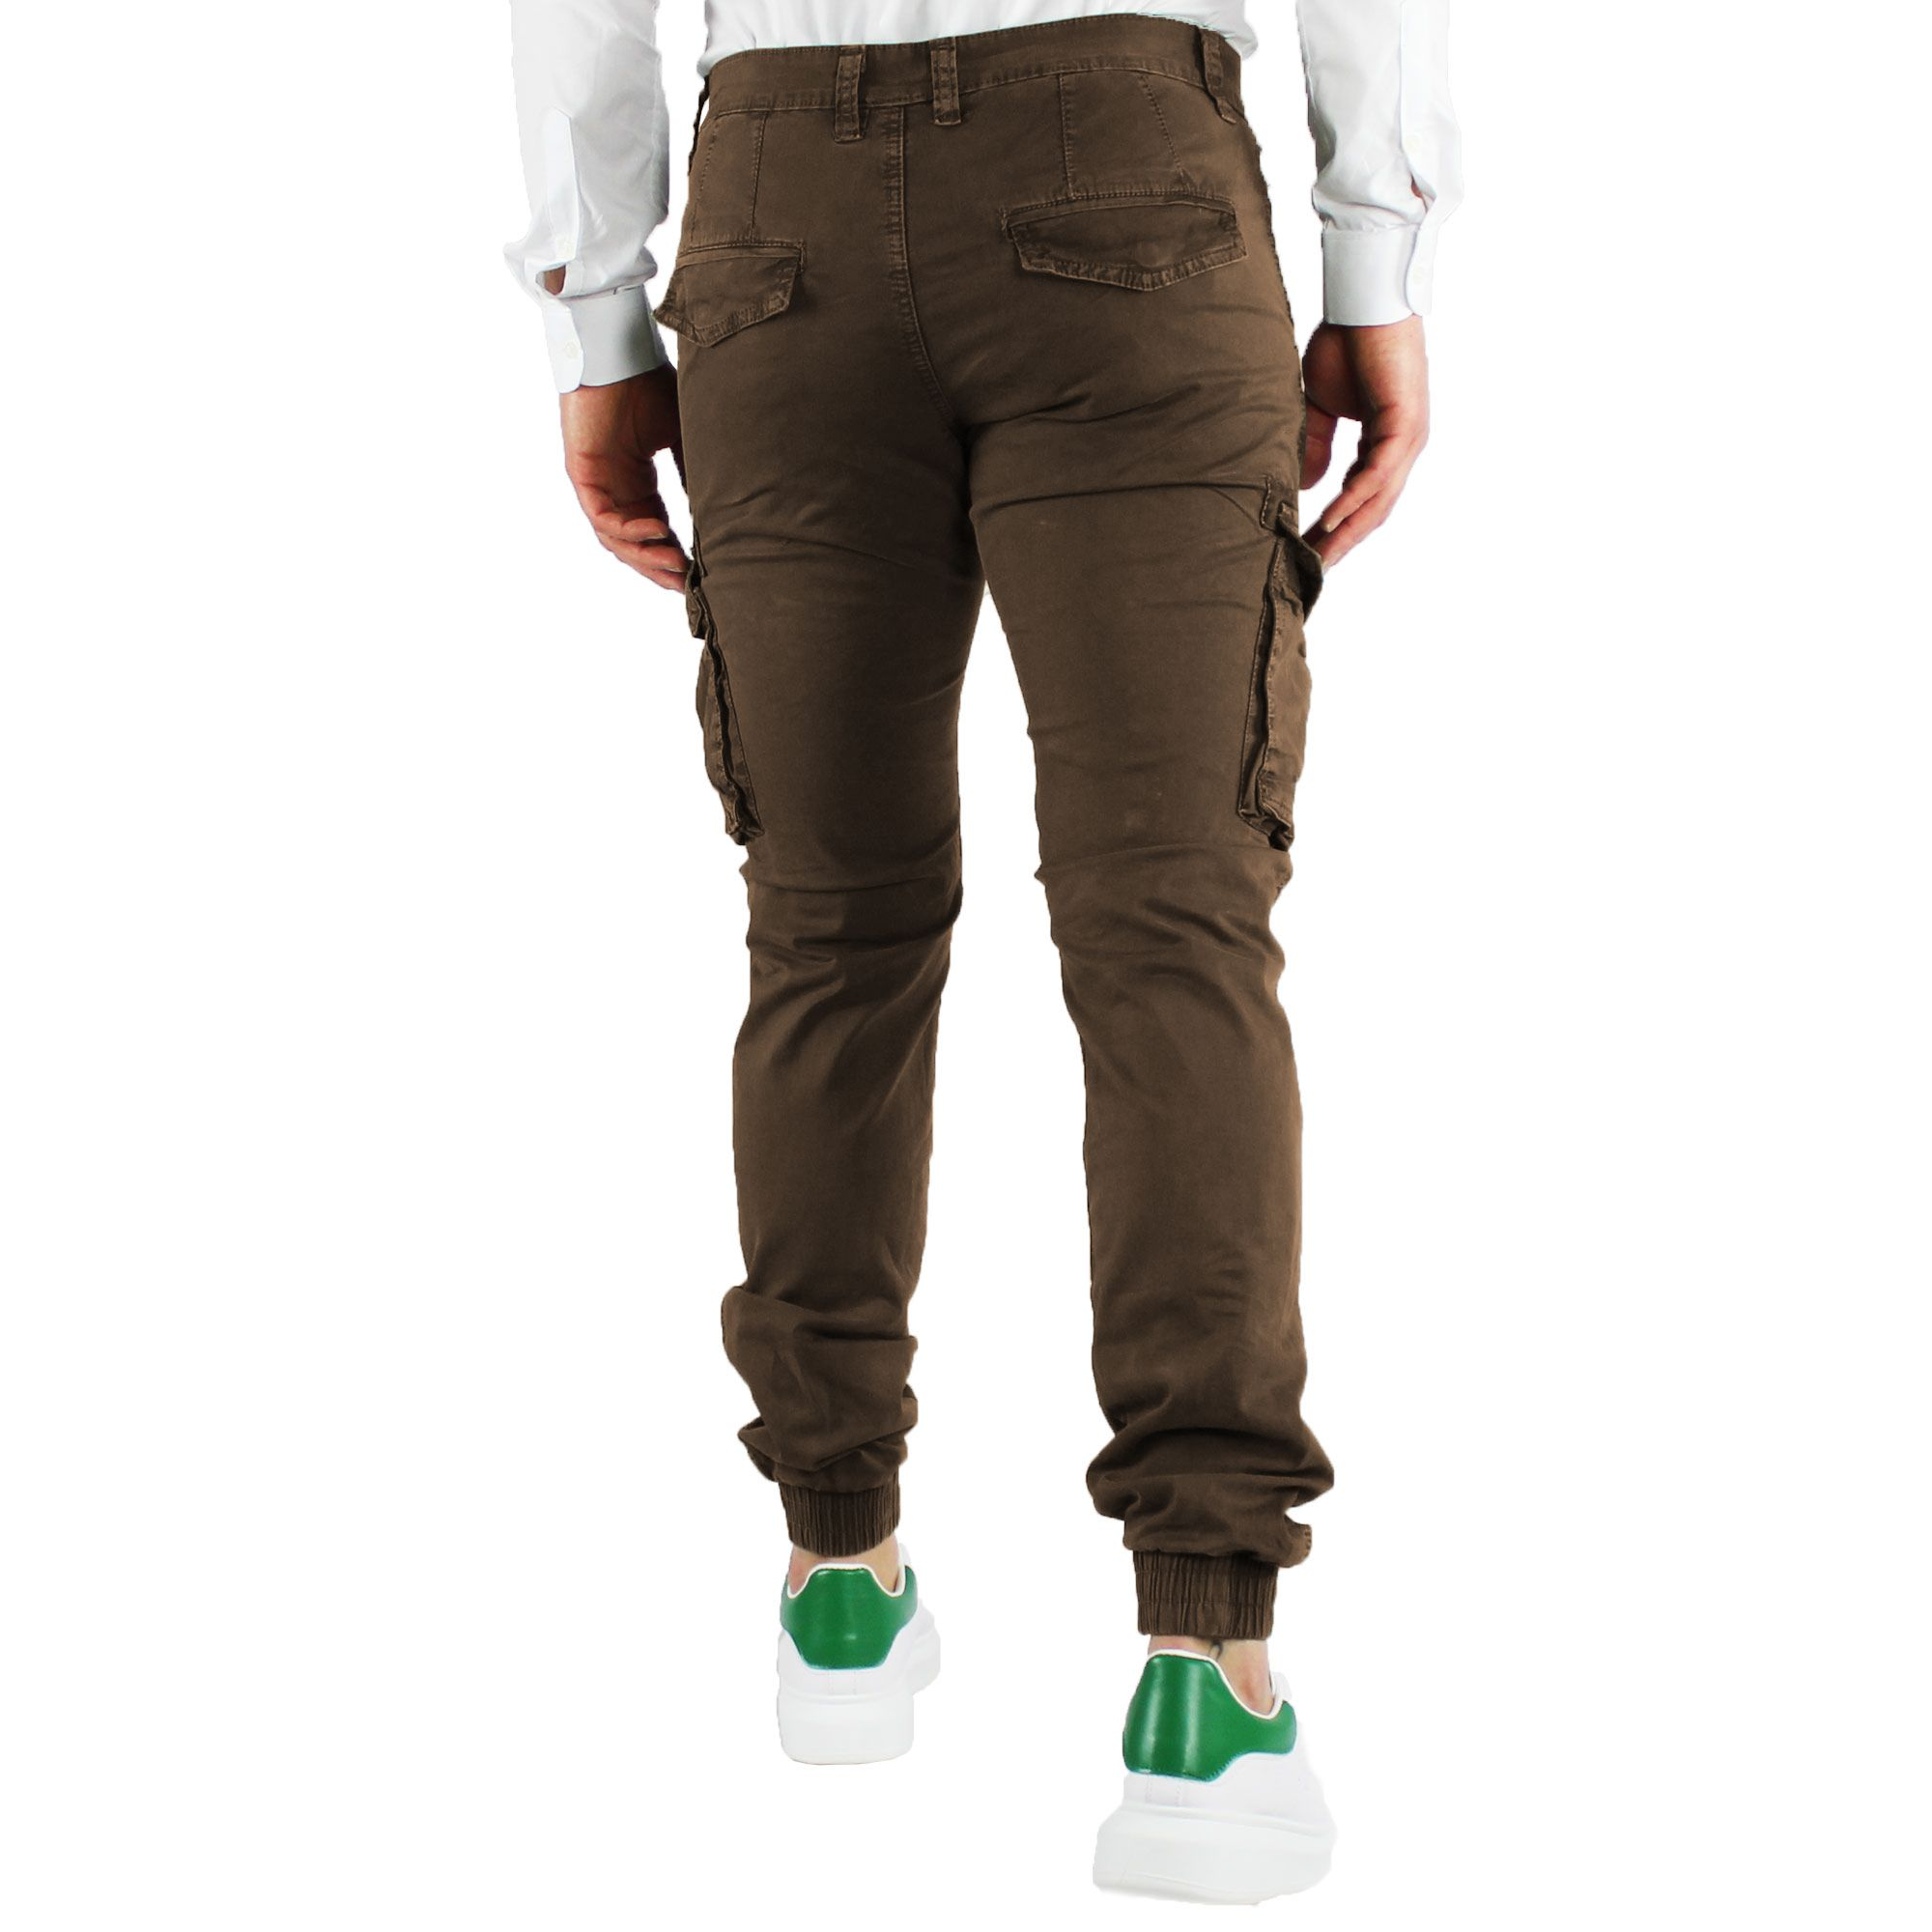 Pantaloni-Uomo-Cargo-Invernali-Pantalone-Tasche-Laterali-SlimFit-Verde-Blu-Fango miniatura 11